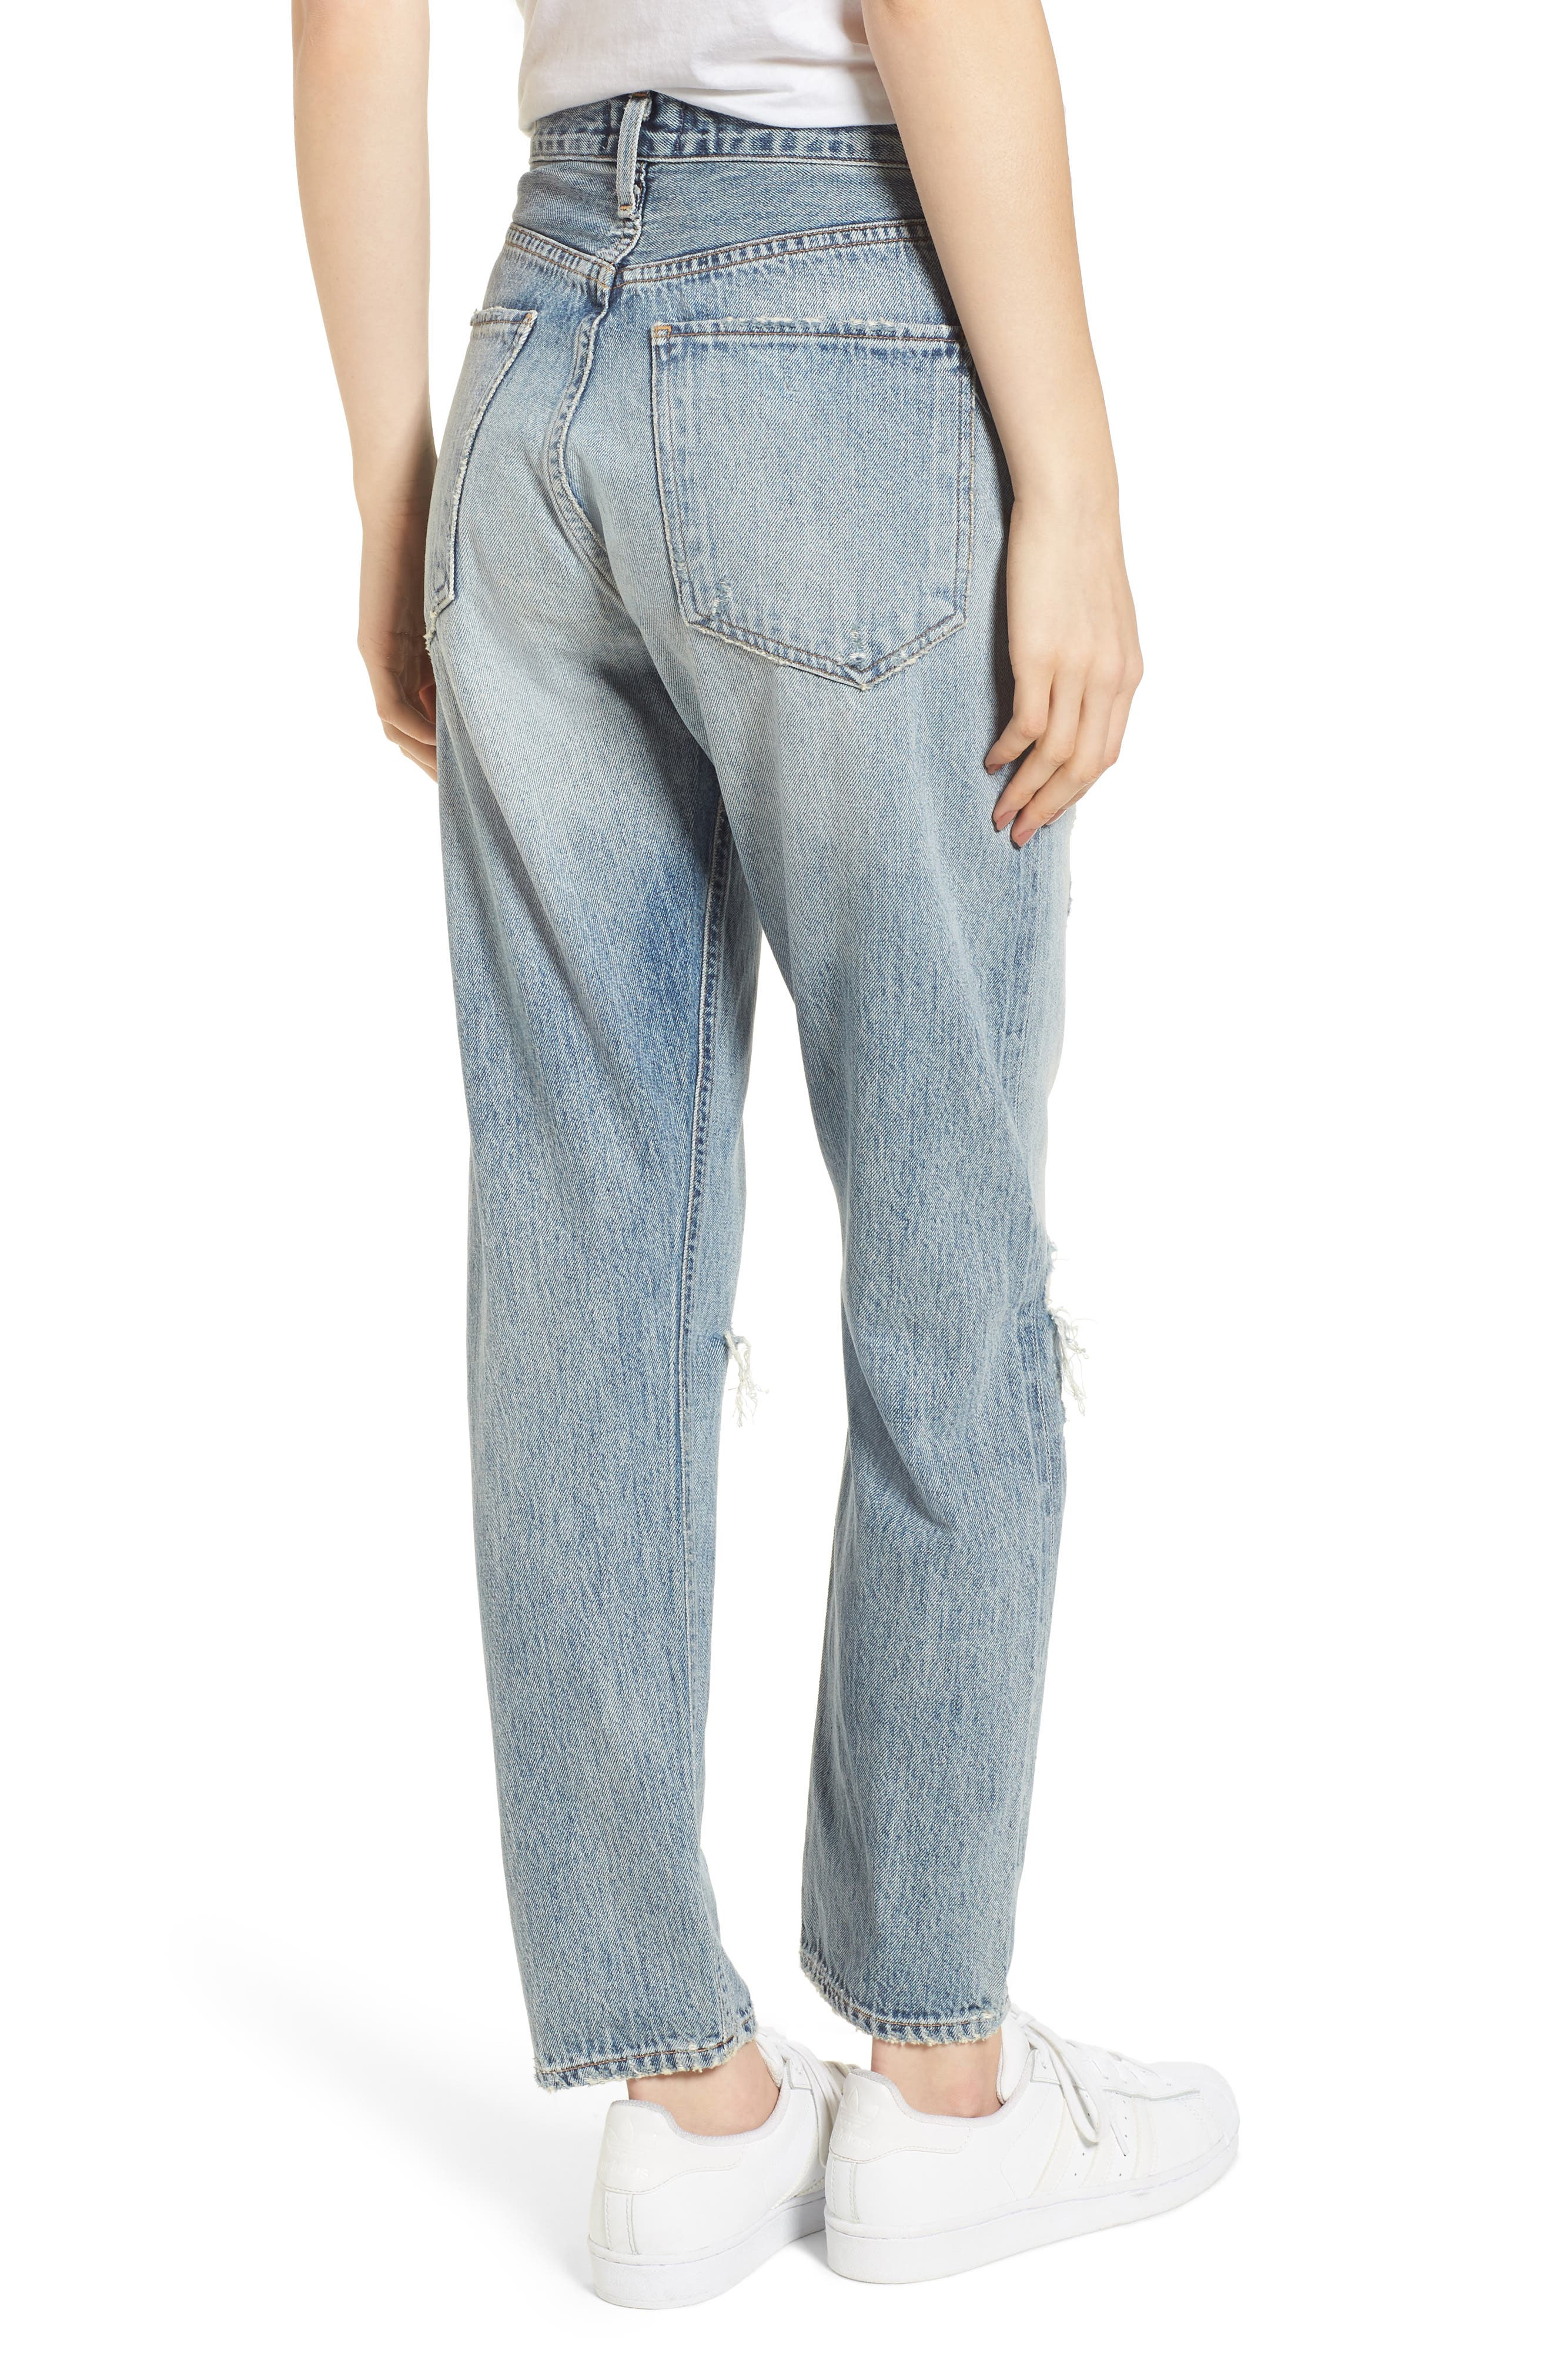 Jamie High Waist Ankle Jeans,                             Alternate thumbnail 2, color,                             RESOLUTION